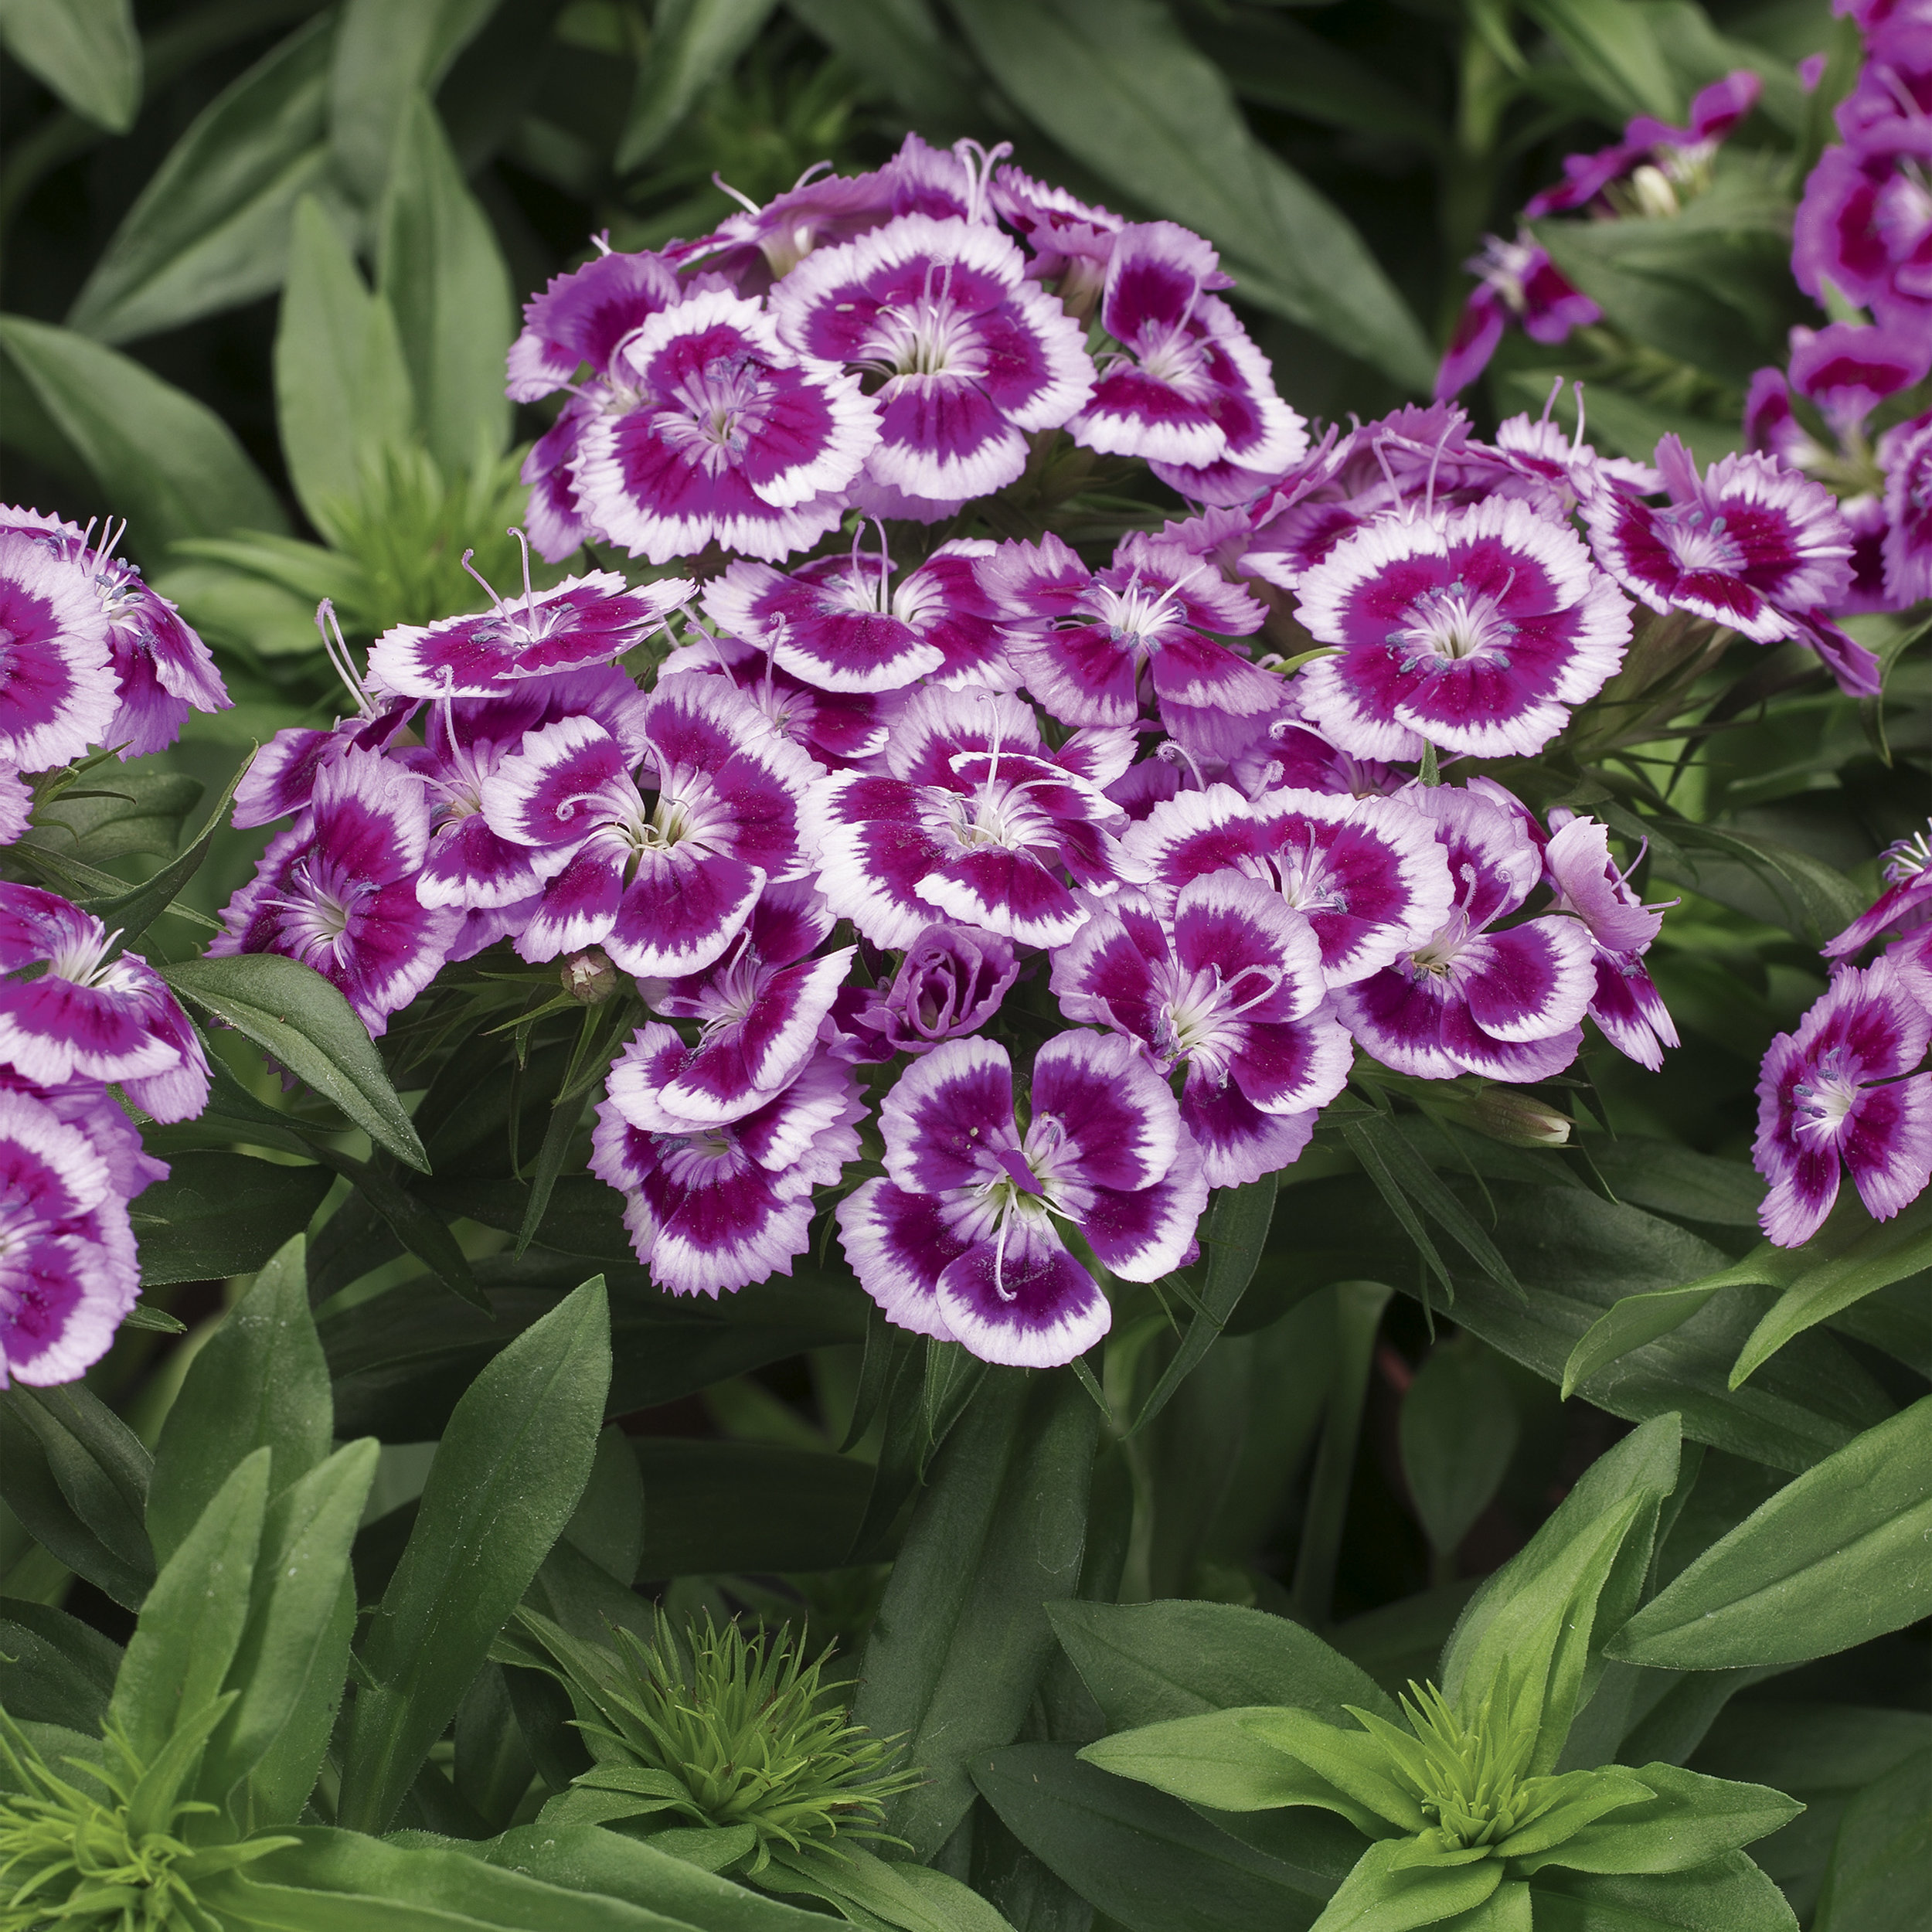 HR_Seed_Dianthus_Barbarini®_Barbarini®_Purple_Picotee_70001021_1.jpg